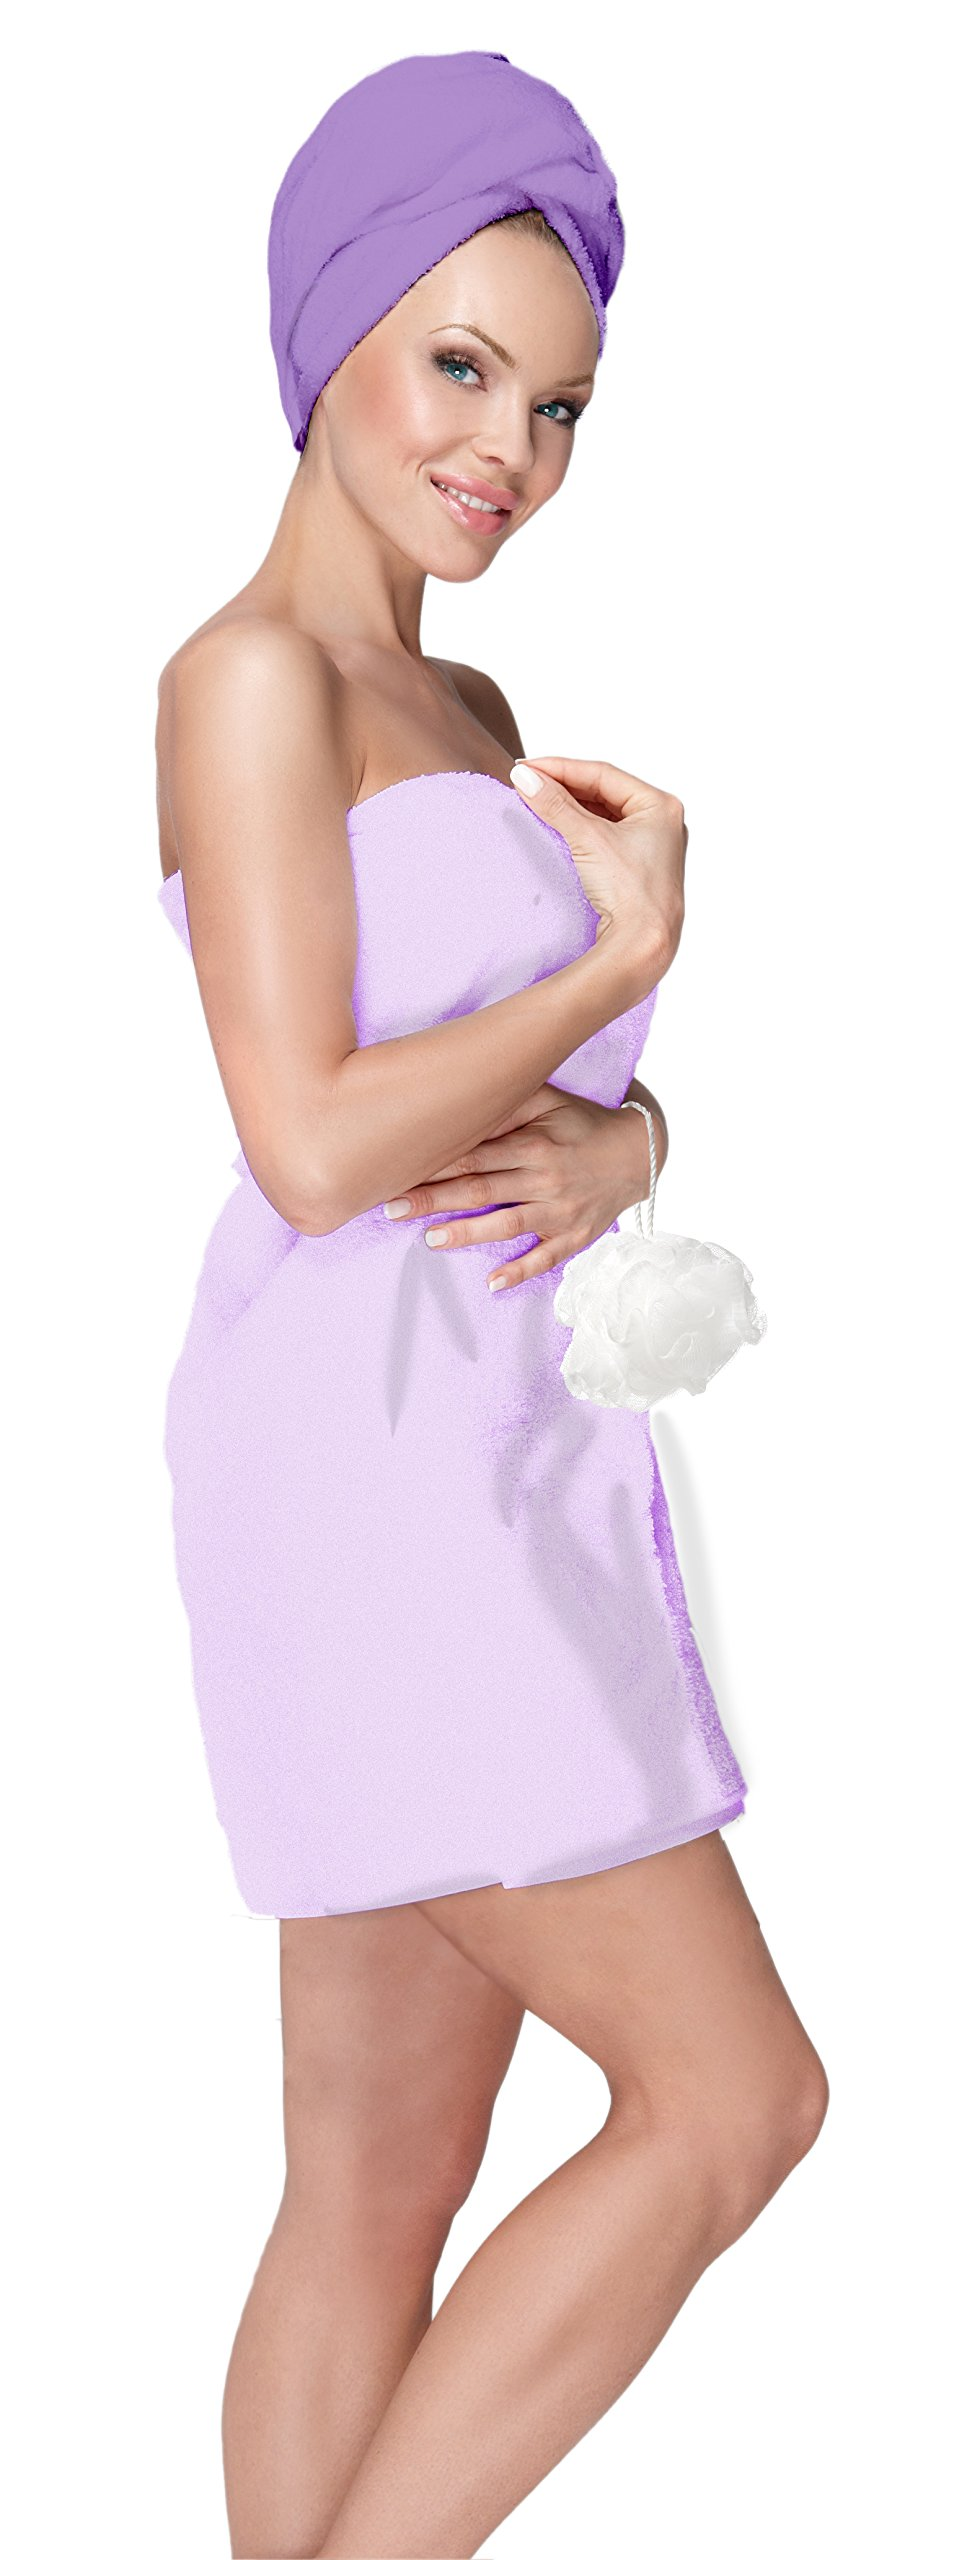 Adrienne Vittadini Women's 3 Piece Bath Body Plush Towel Wrap Spa Set | Bath Body Towel Wrap with Adjustable Fastener, Hair Towel Twist, Loofah/Bath Body Sponge